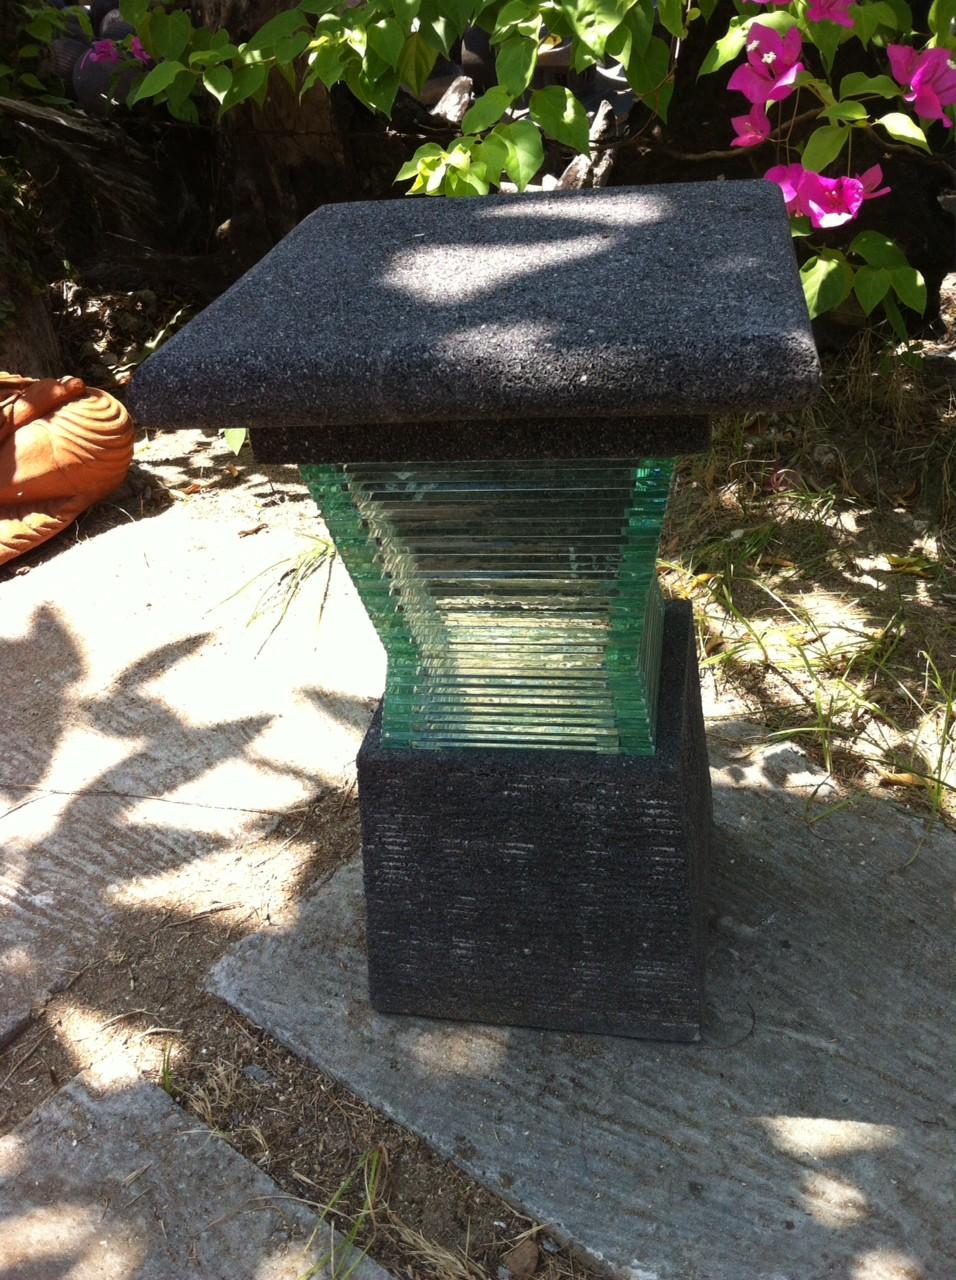 lampe de jardin en pierre de lave et verre design 40cm. Black Bedroom Furniture Sets. Home Design Ideas